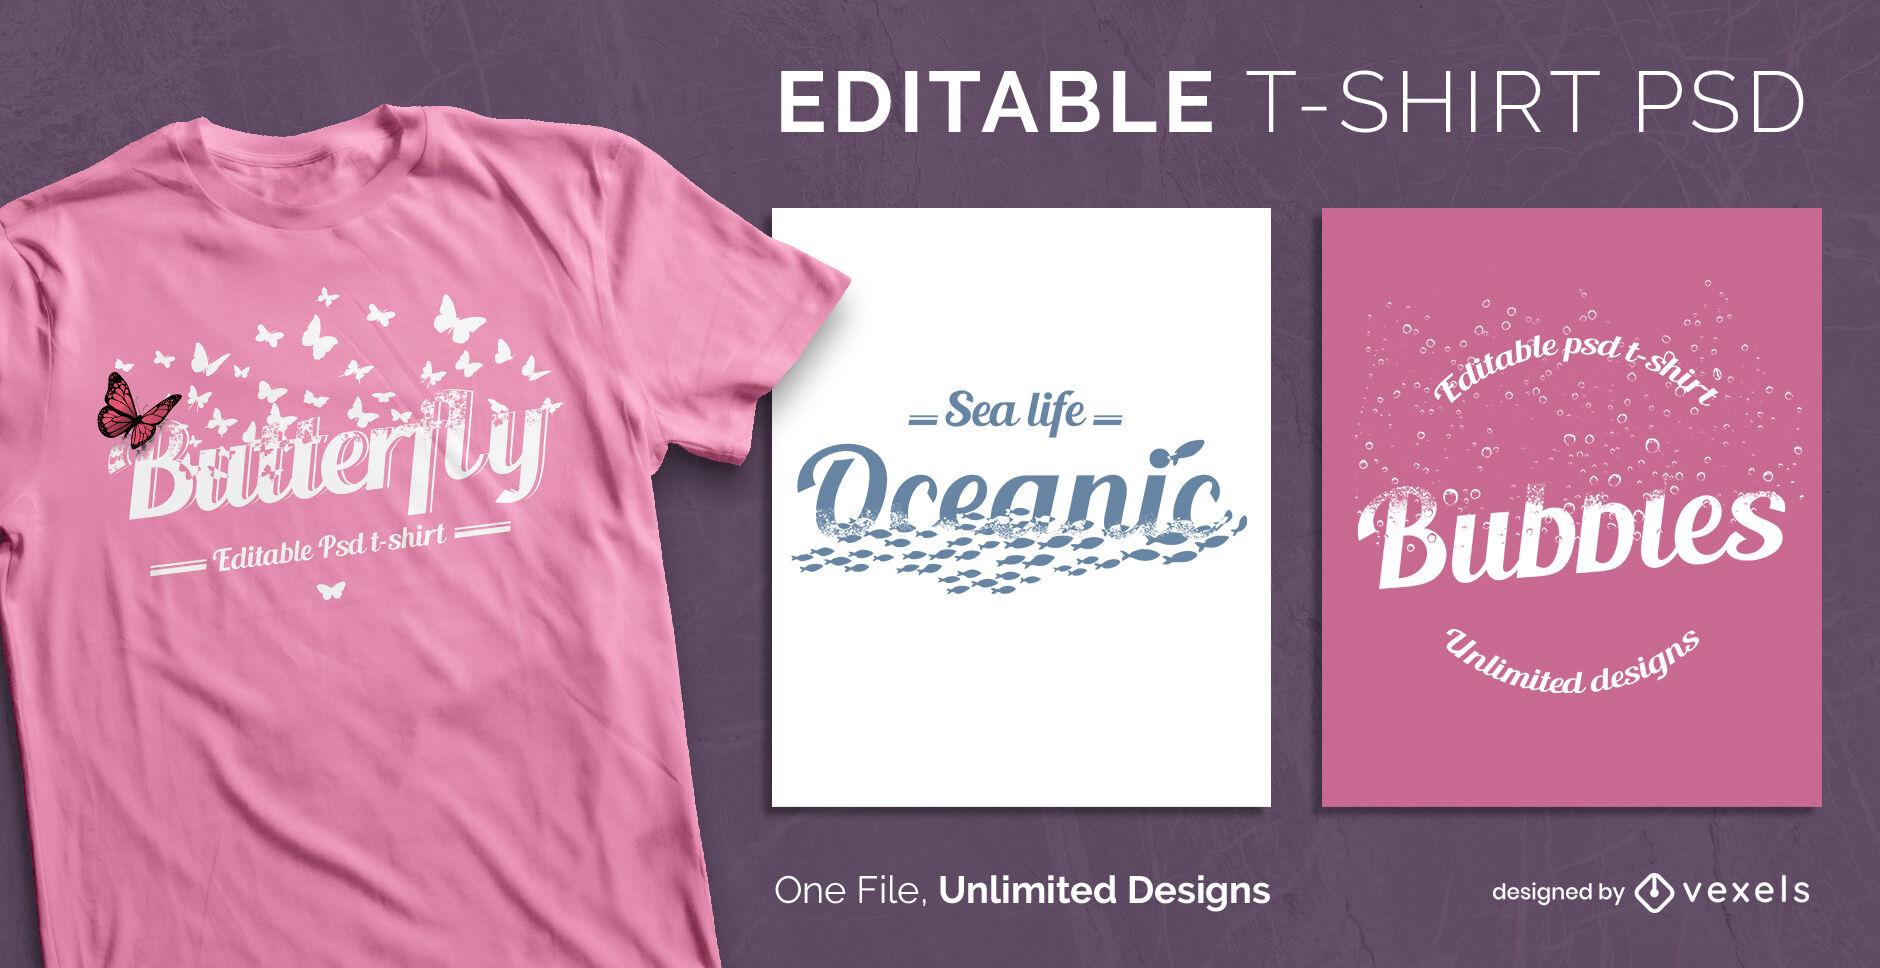 Dissolving shape scalable t-shirt template